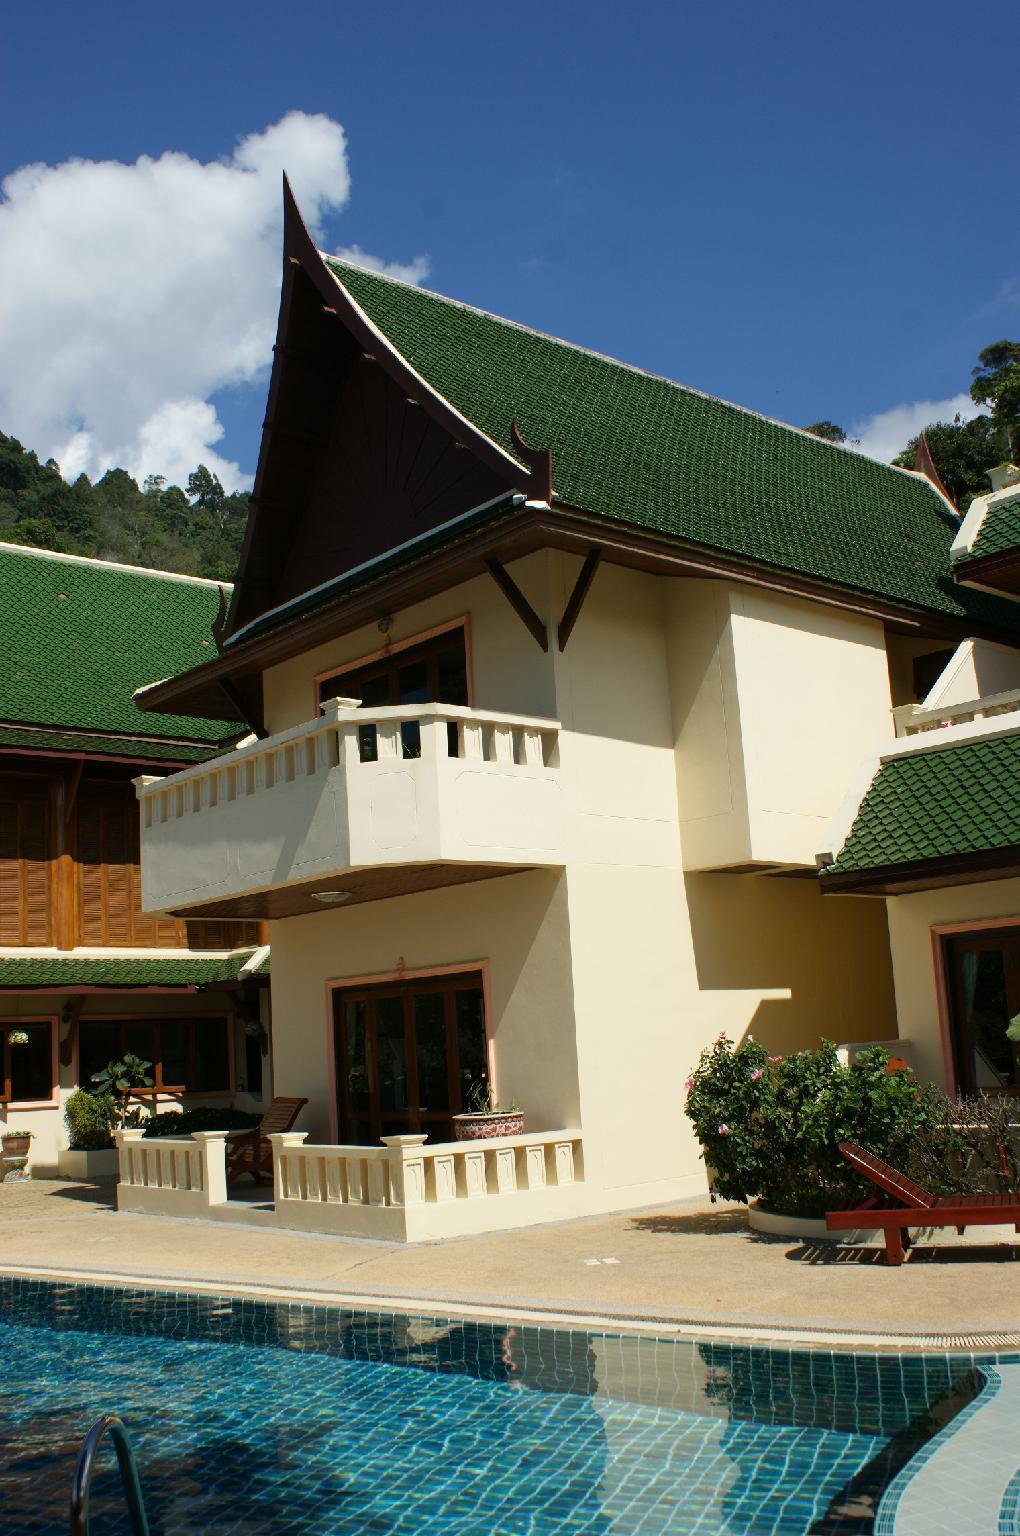 The Thai House At Prince Edouard Resort